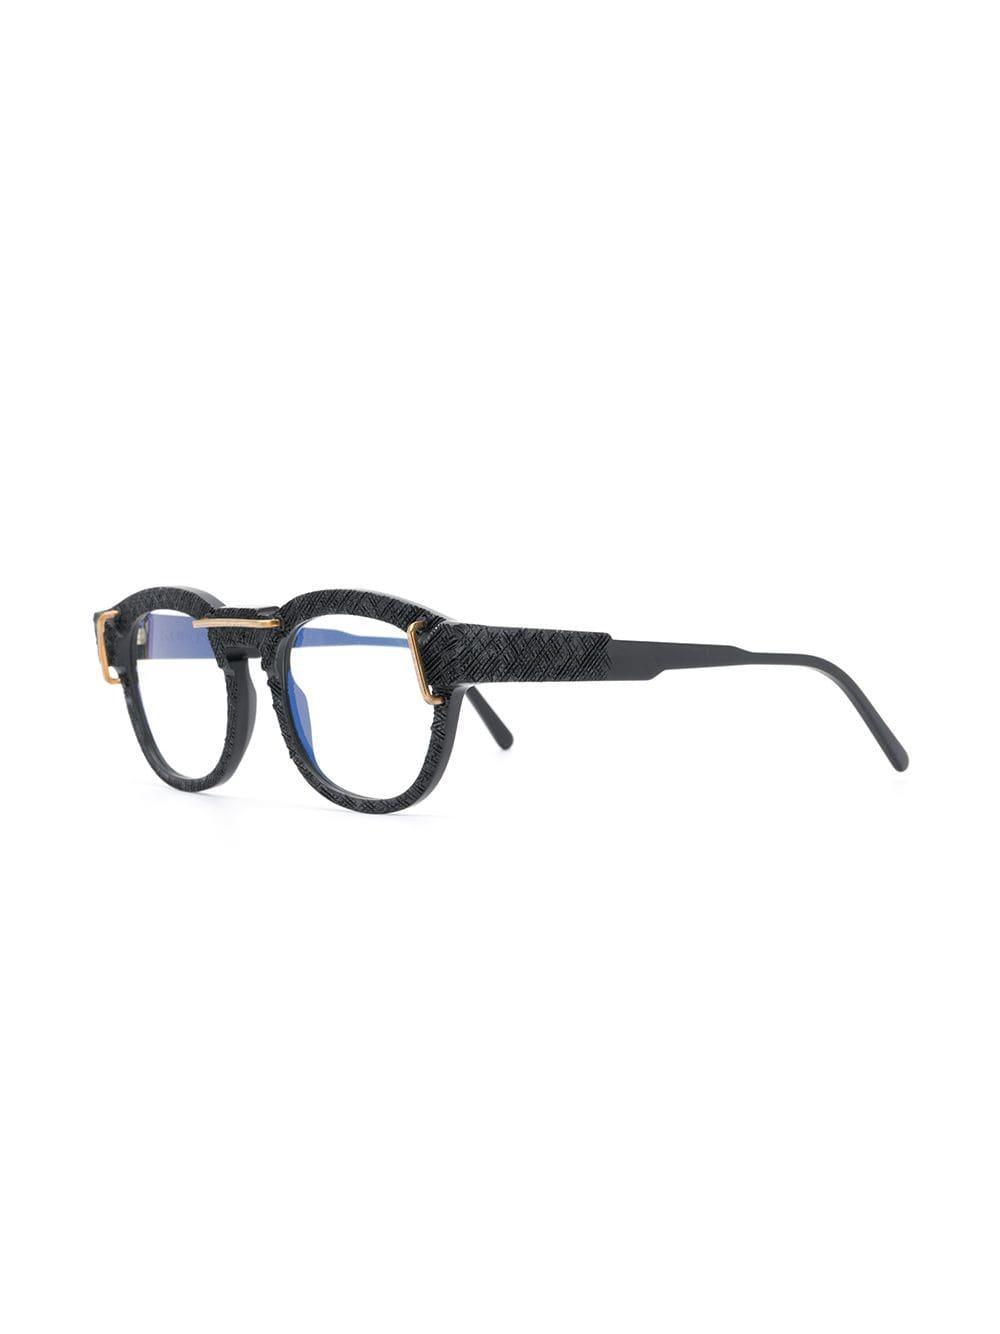 ff99b0ba8a Kuboraum - Black Textured Frame Glasses - Lyst. View fullscreen